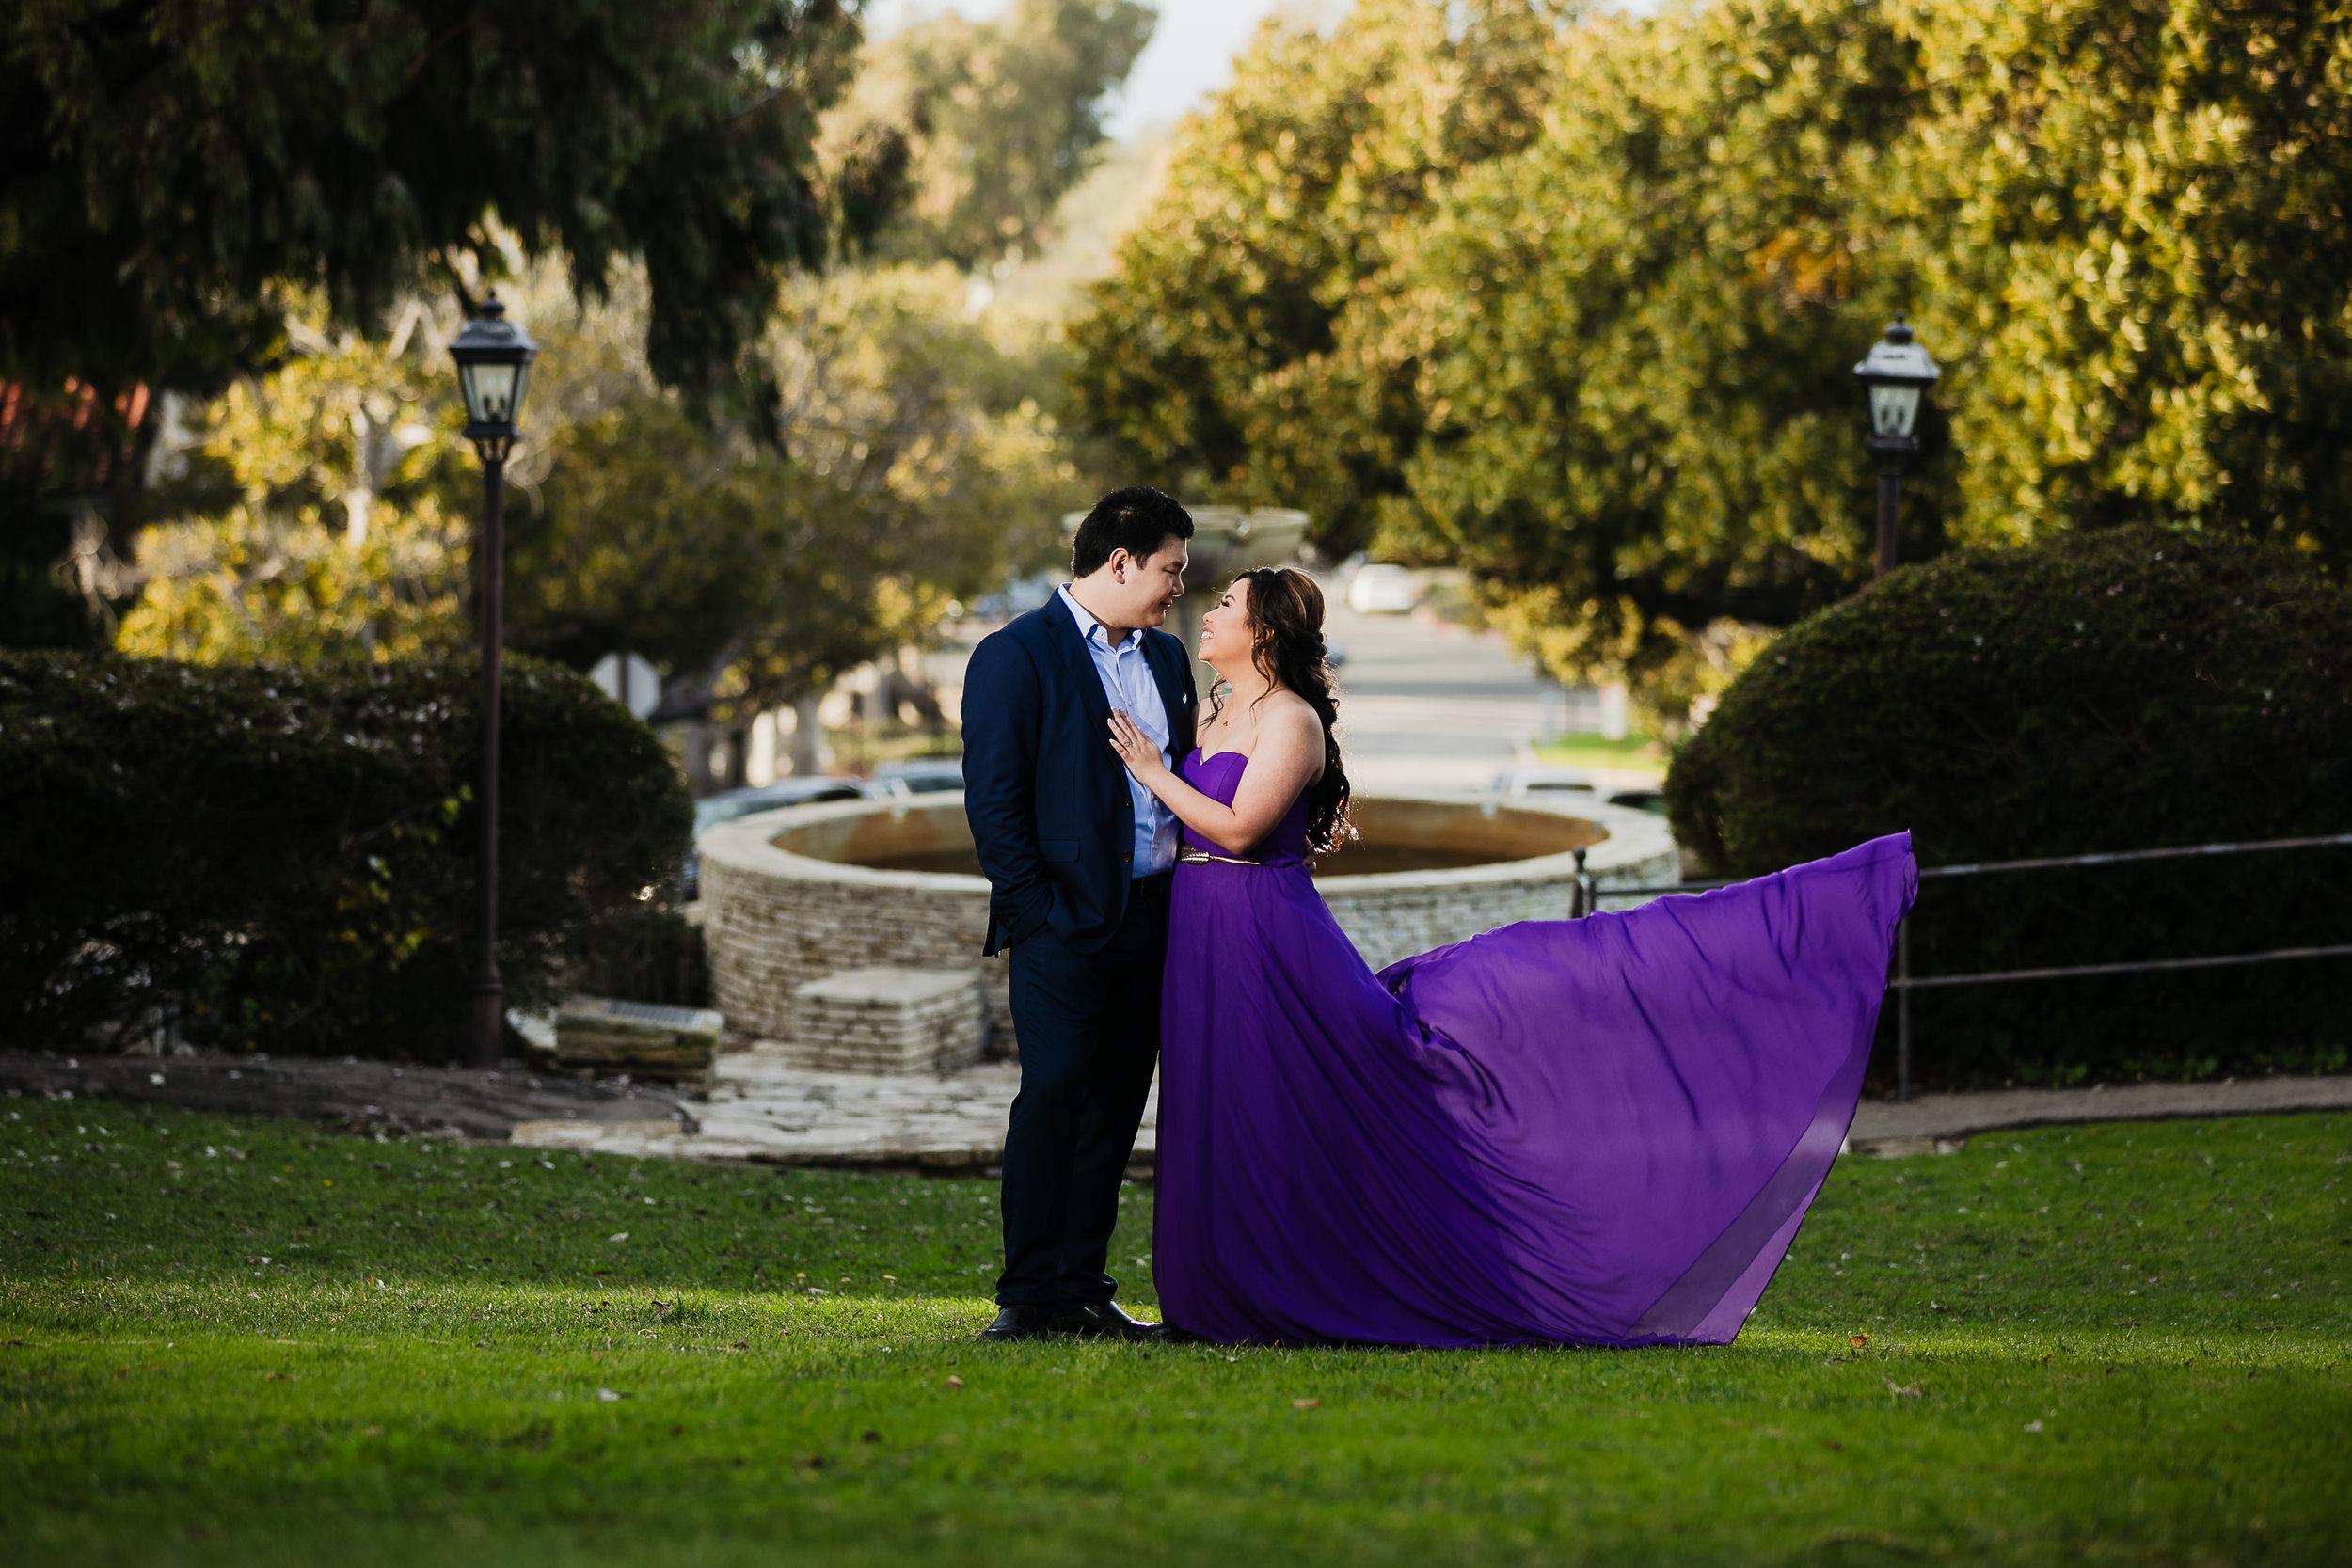 MD-Rancho-Palos-Verdes_Malaga-Cove-Engagement-Photography 79.jpg